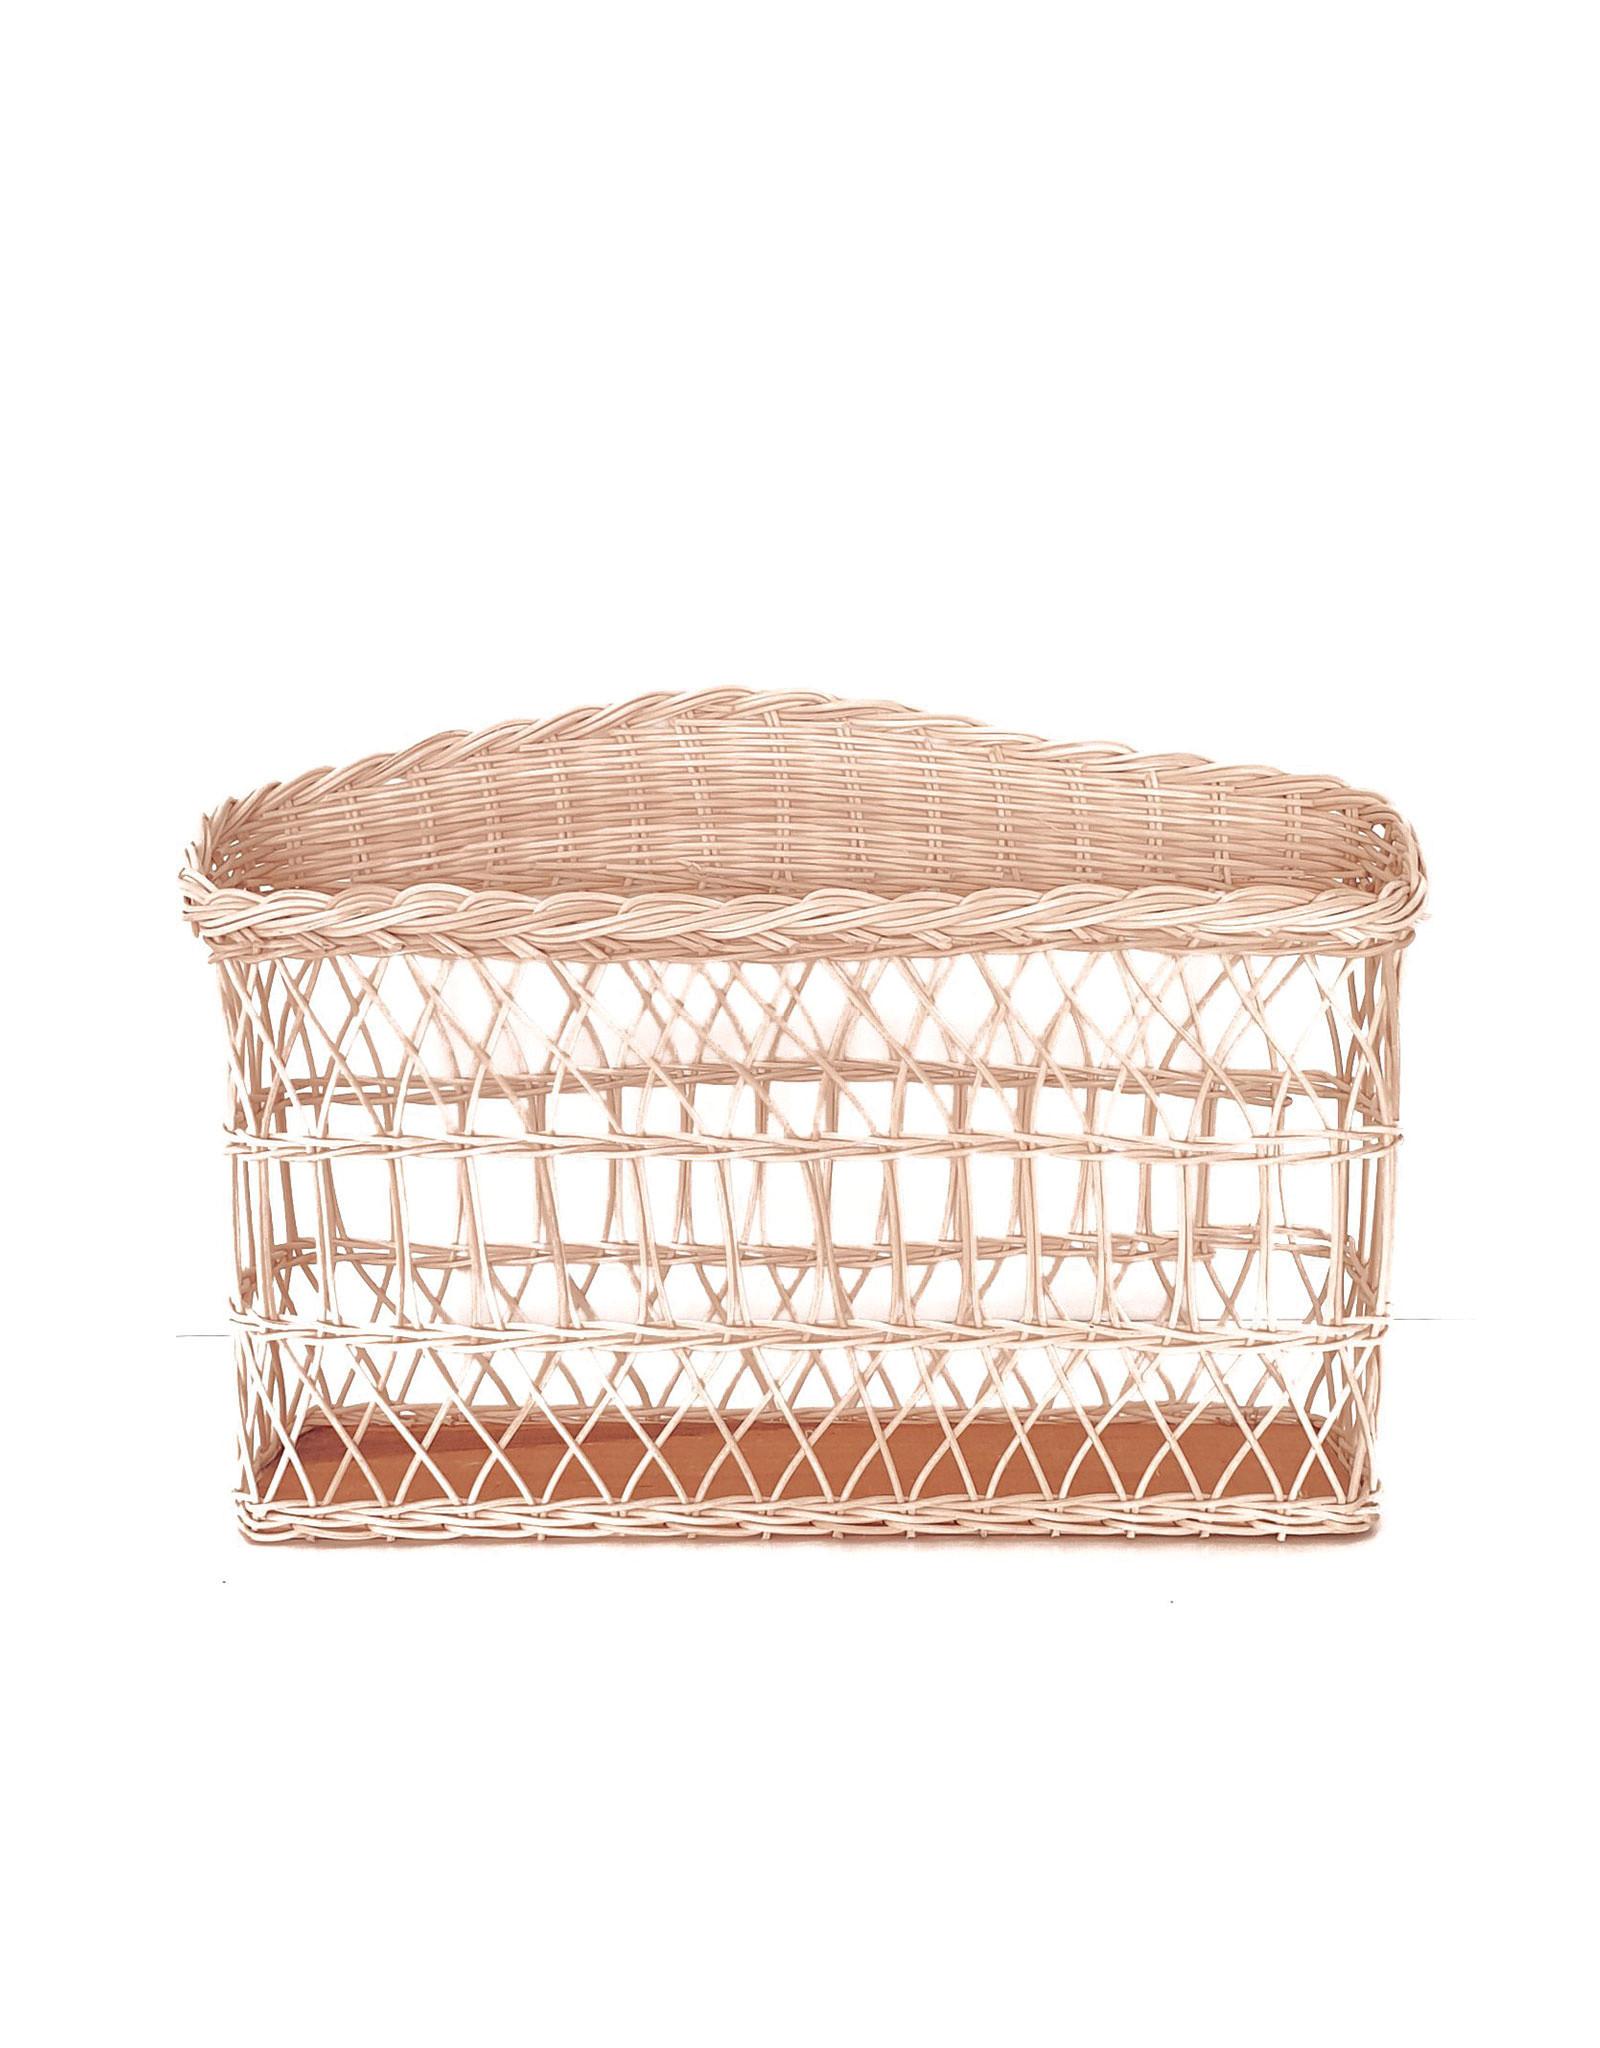 Coconeh Wiker Rectangle Basket